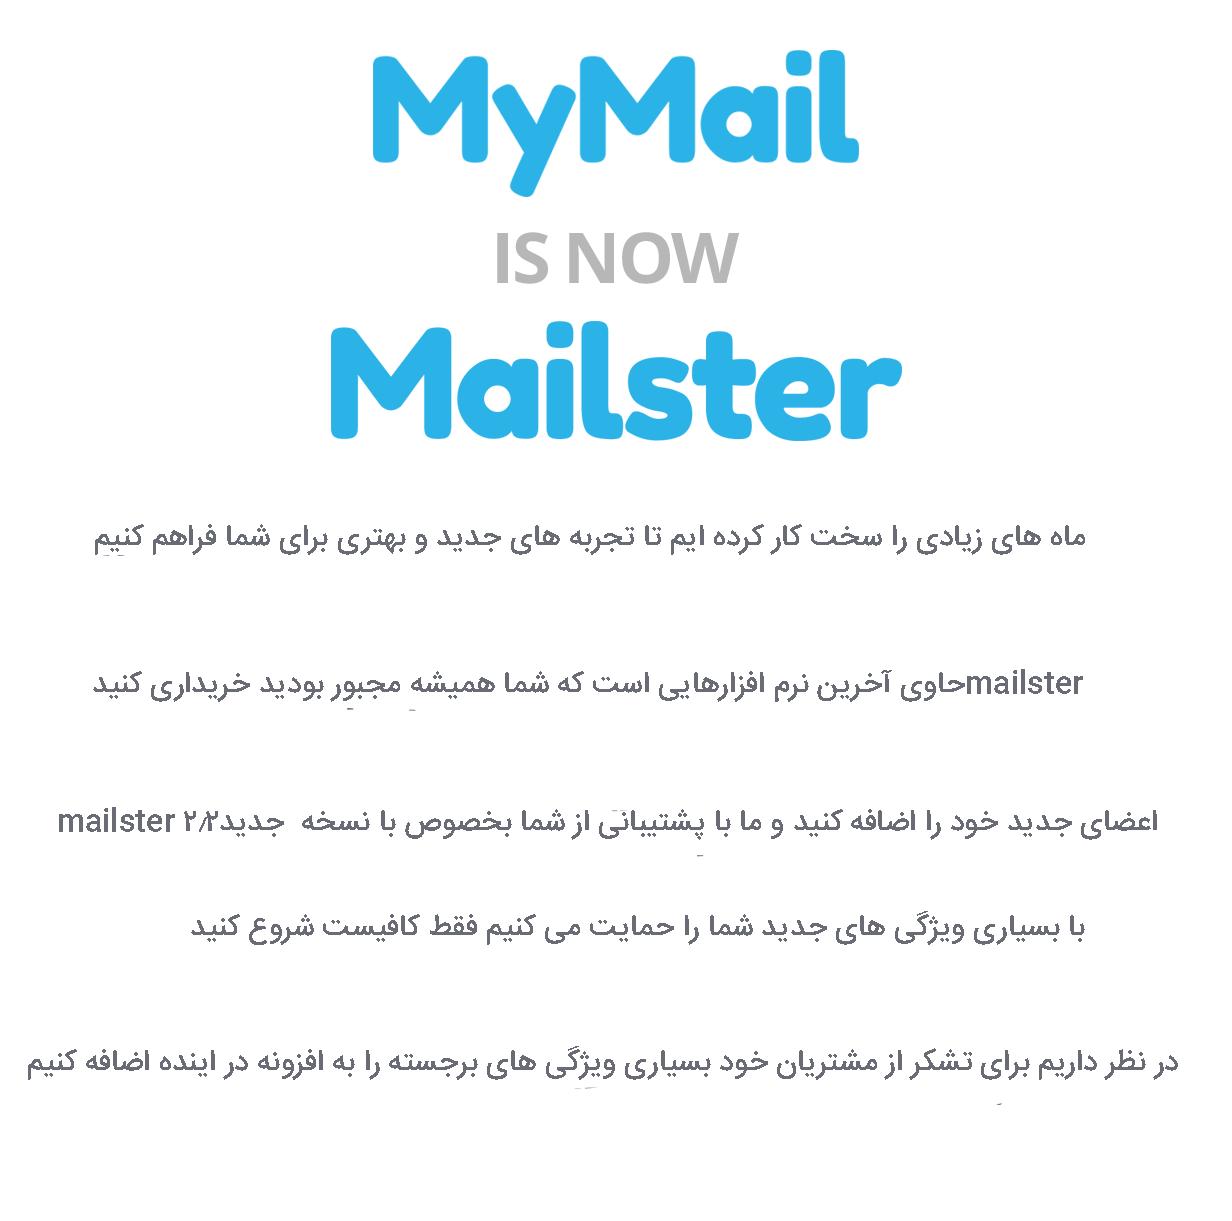 افزونه MyMail - افزونه Mailster